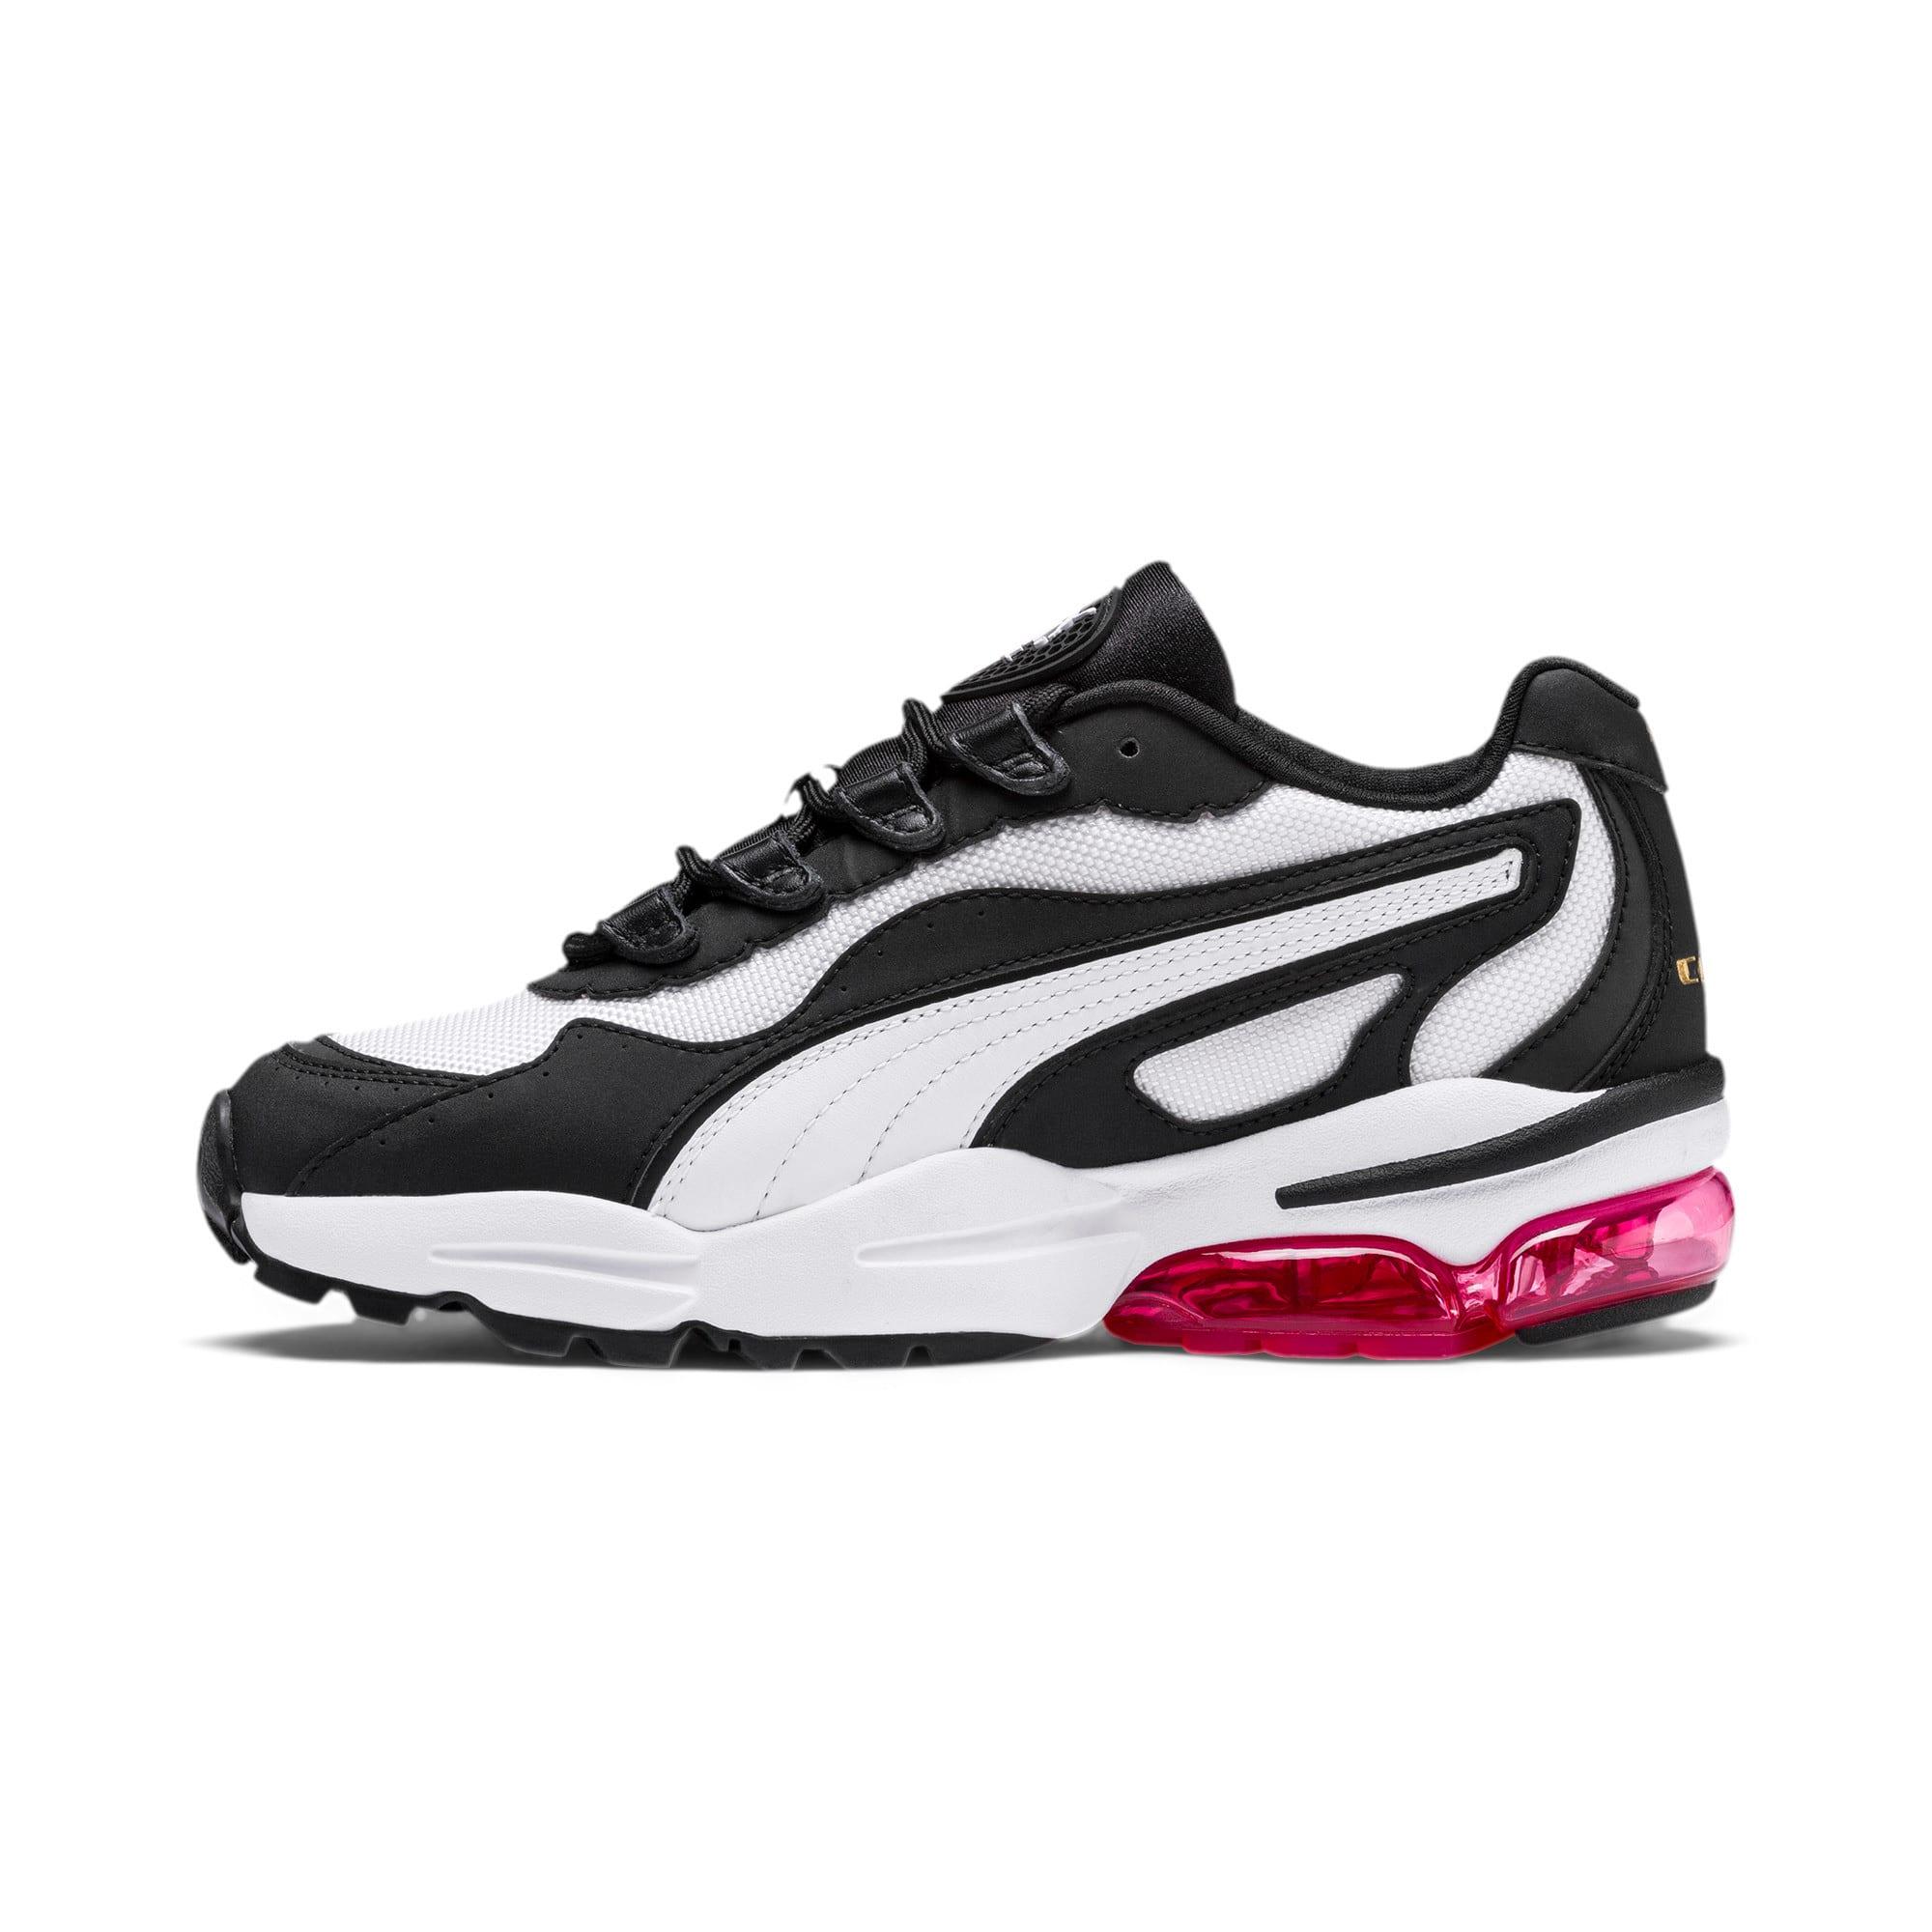 Thumbnail 1 of CELL Stellar Damen Sneaker, Puma White-Puma Black, medium